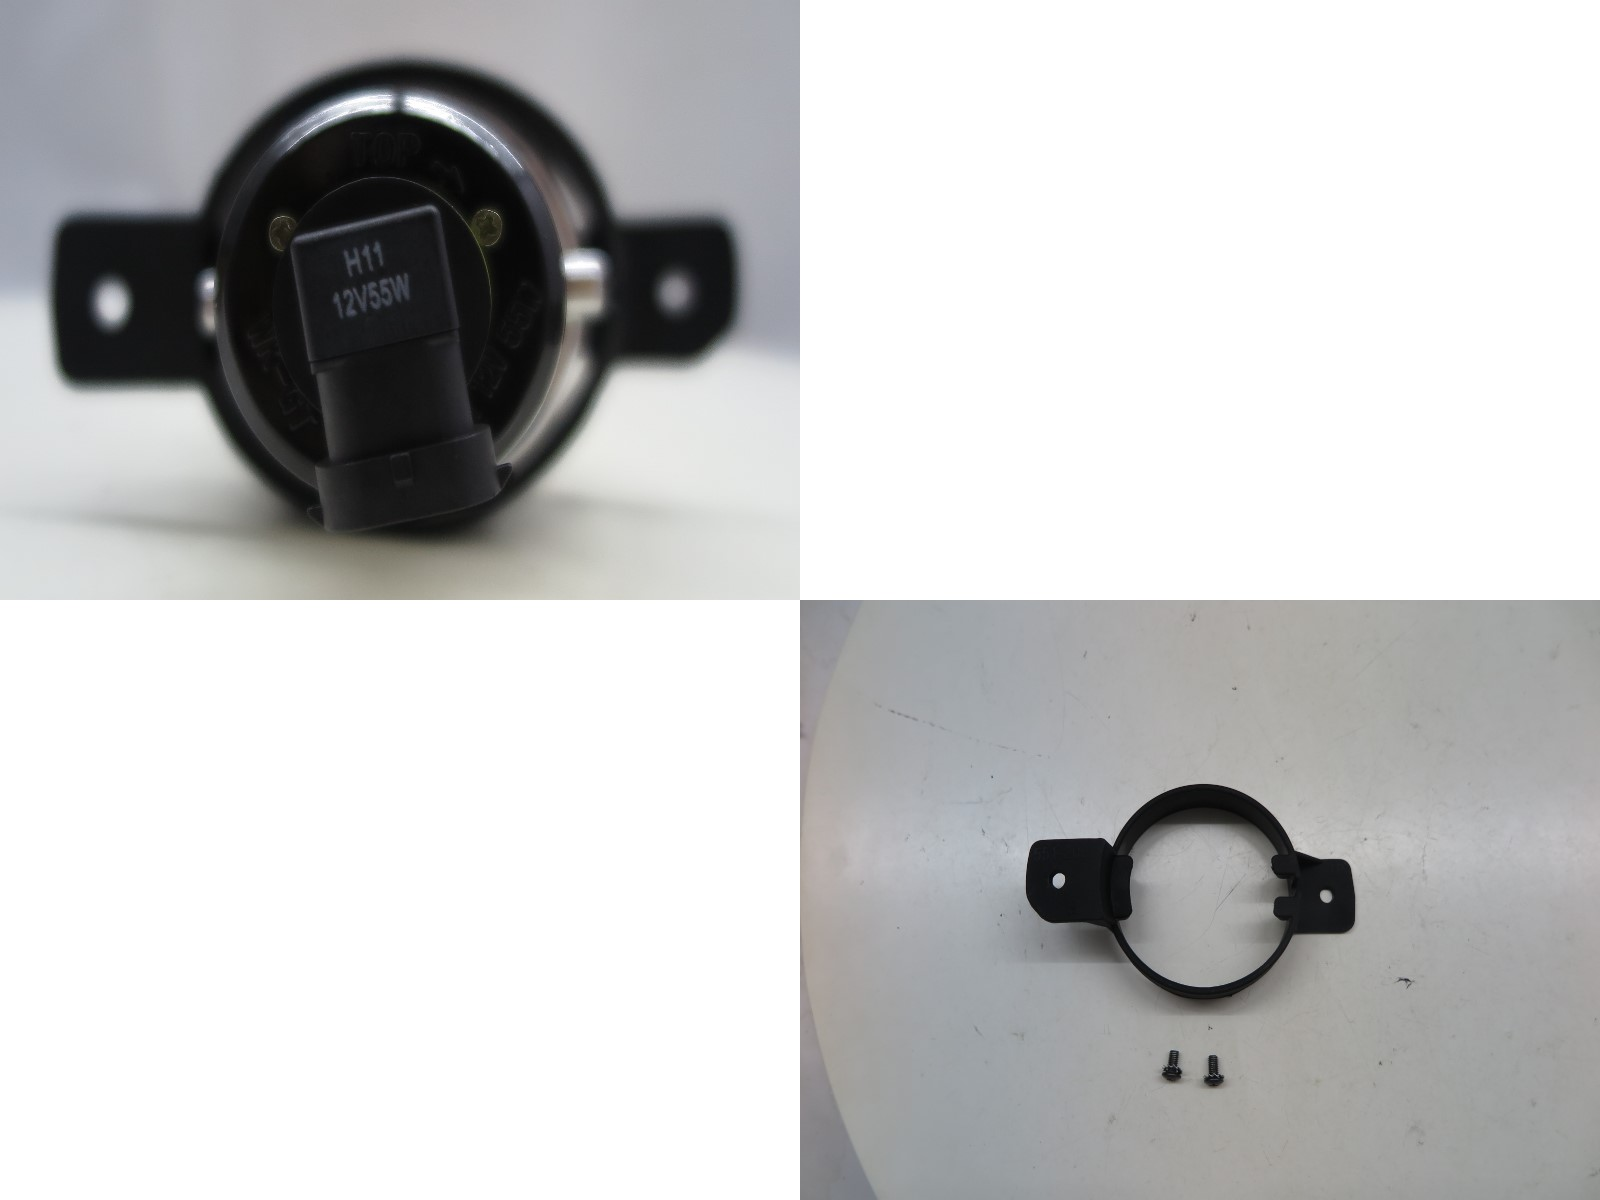 thumbnail 4 - VERSA N17 Second generation 2012-2019 Sedan Projector Fog Light Black for NISSAN